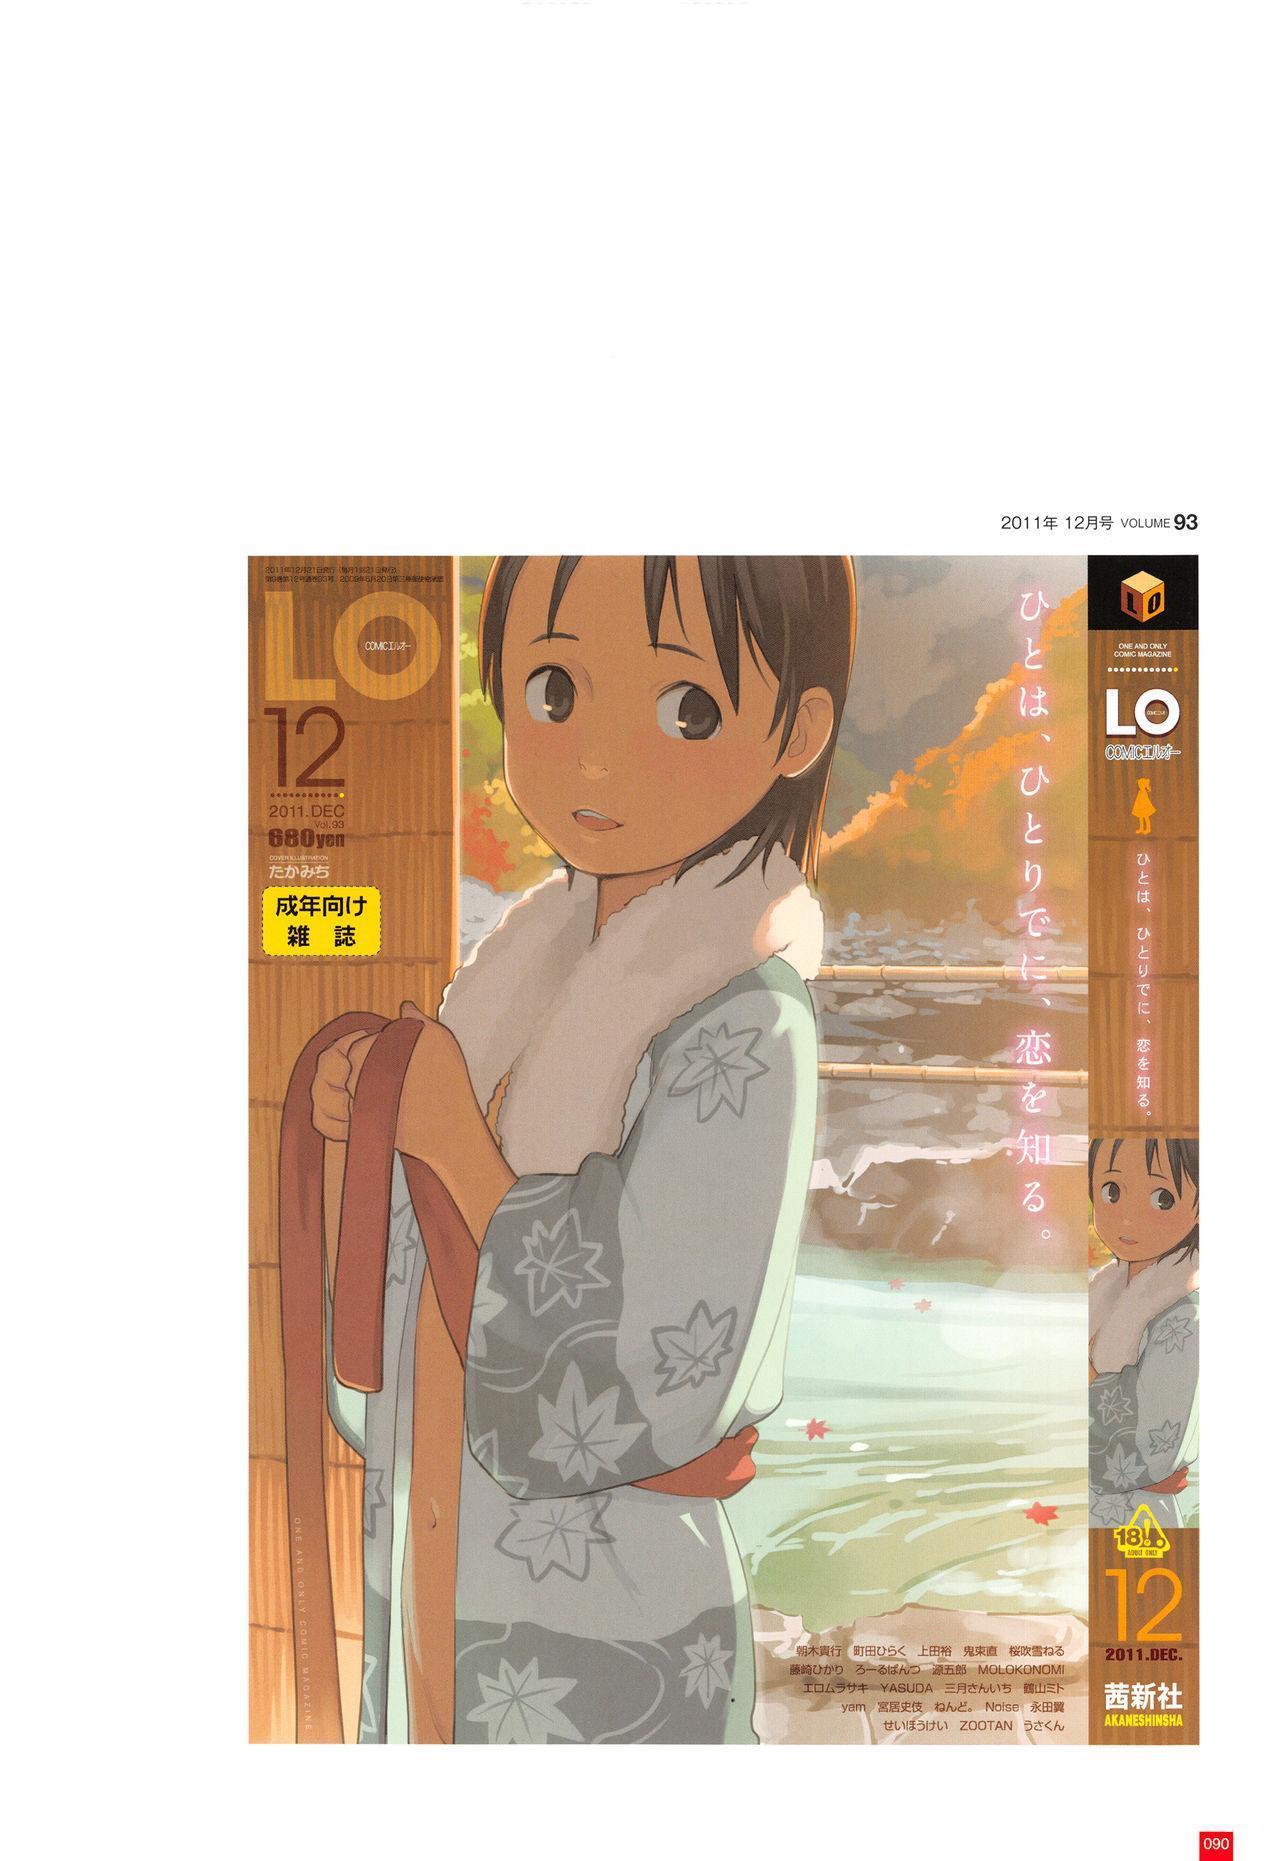 LO Artbook 2-A TAKAMICHI LOOP WORKS 92